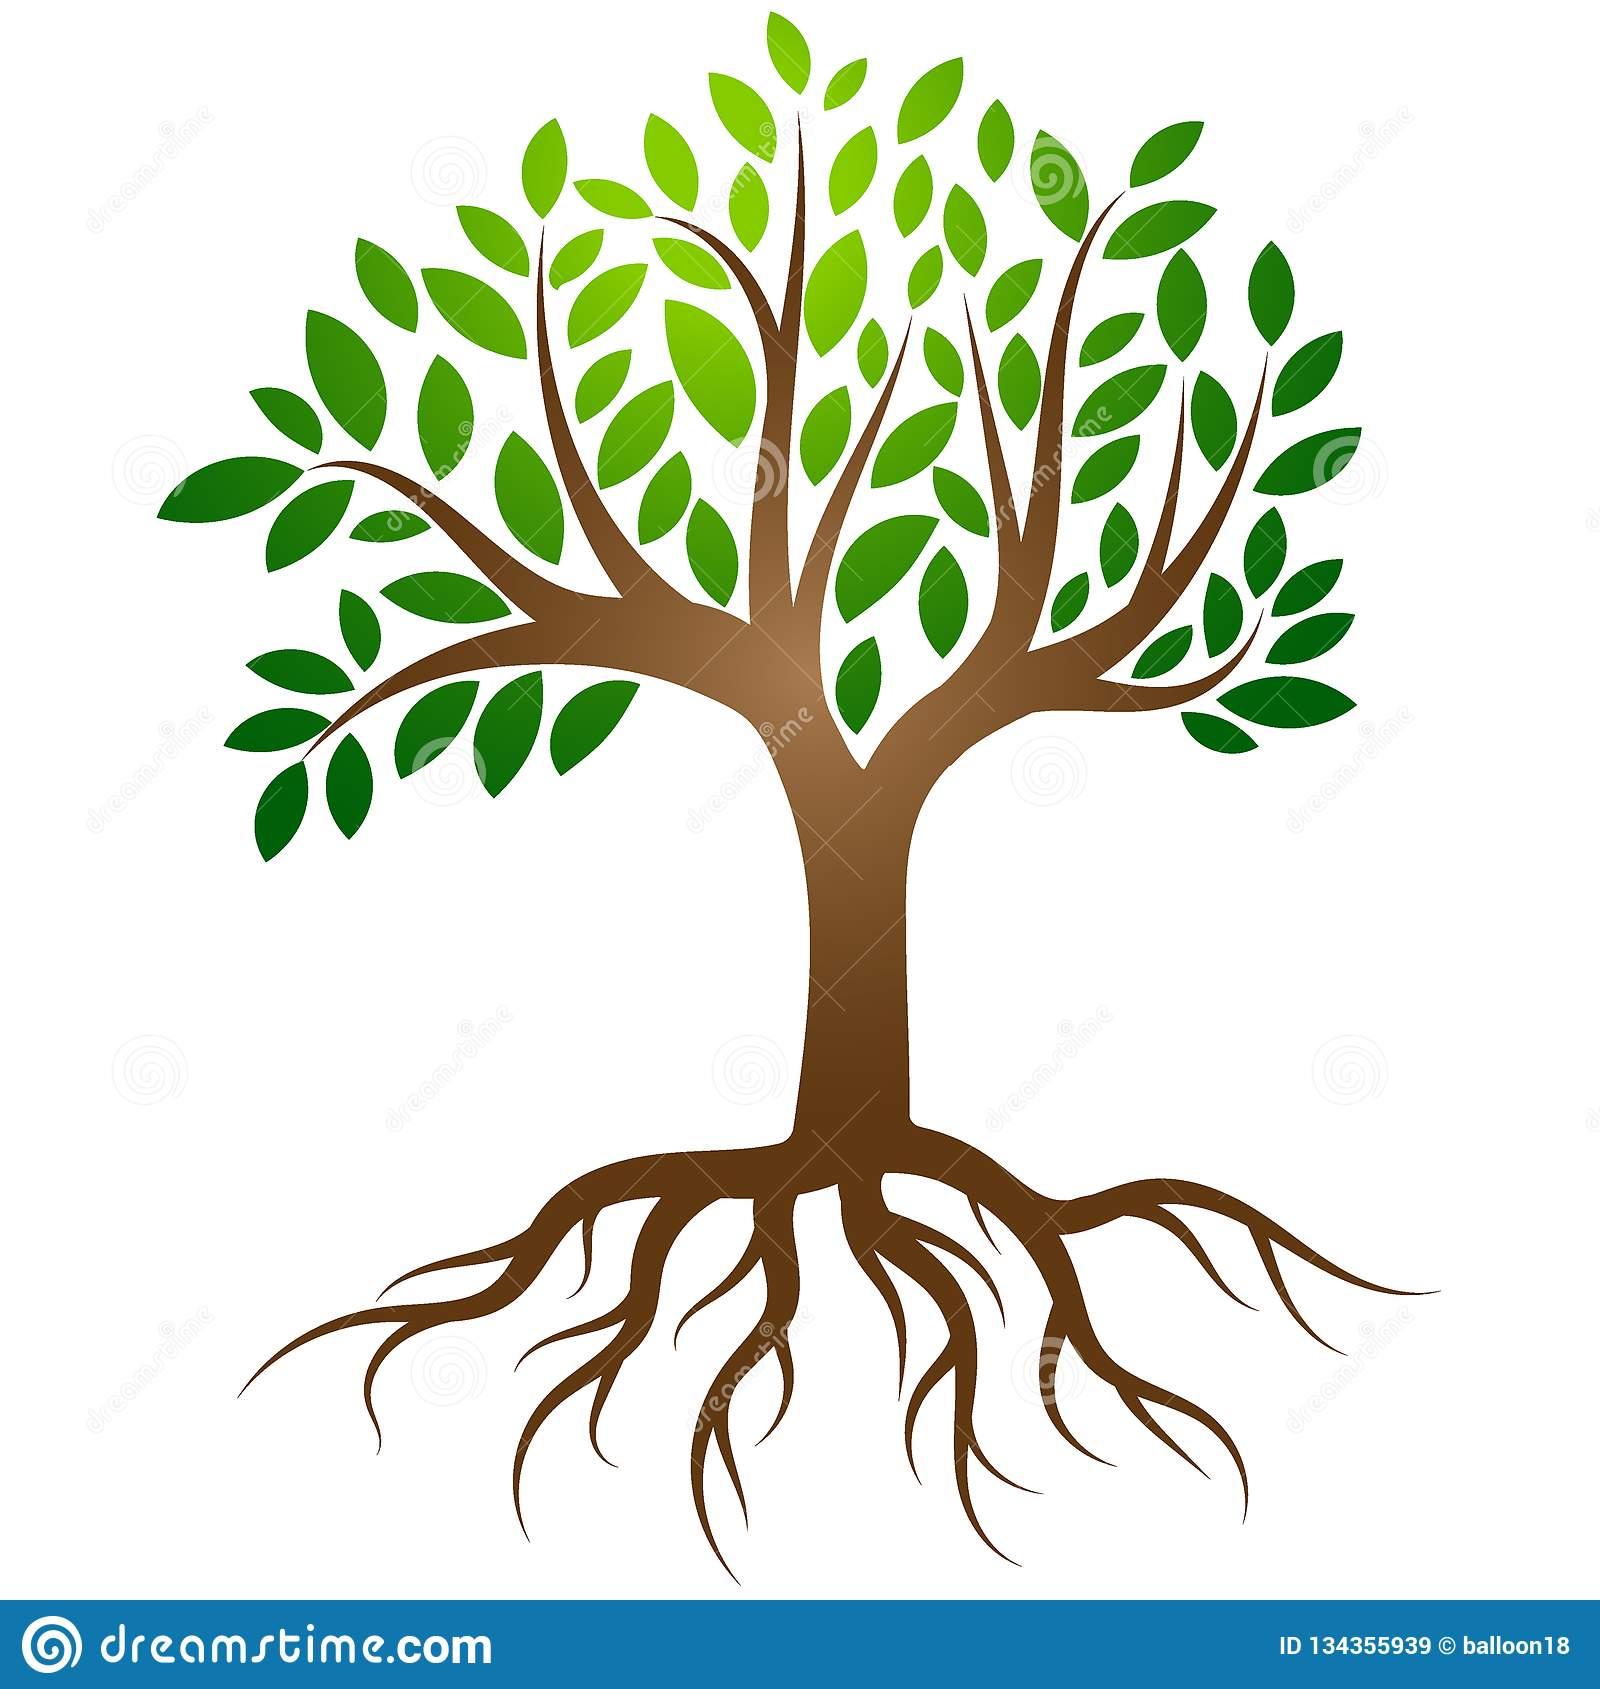 Tree roots logo vector stock vector. Illustration of company.